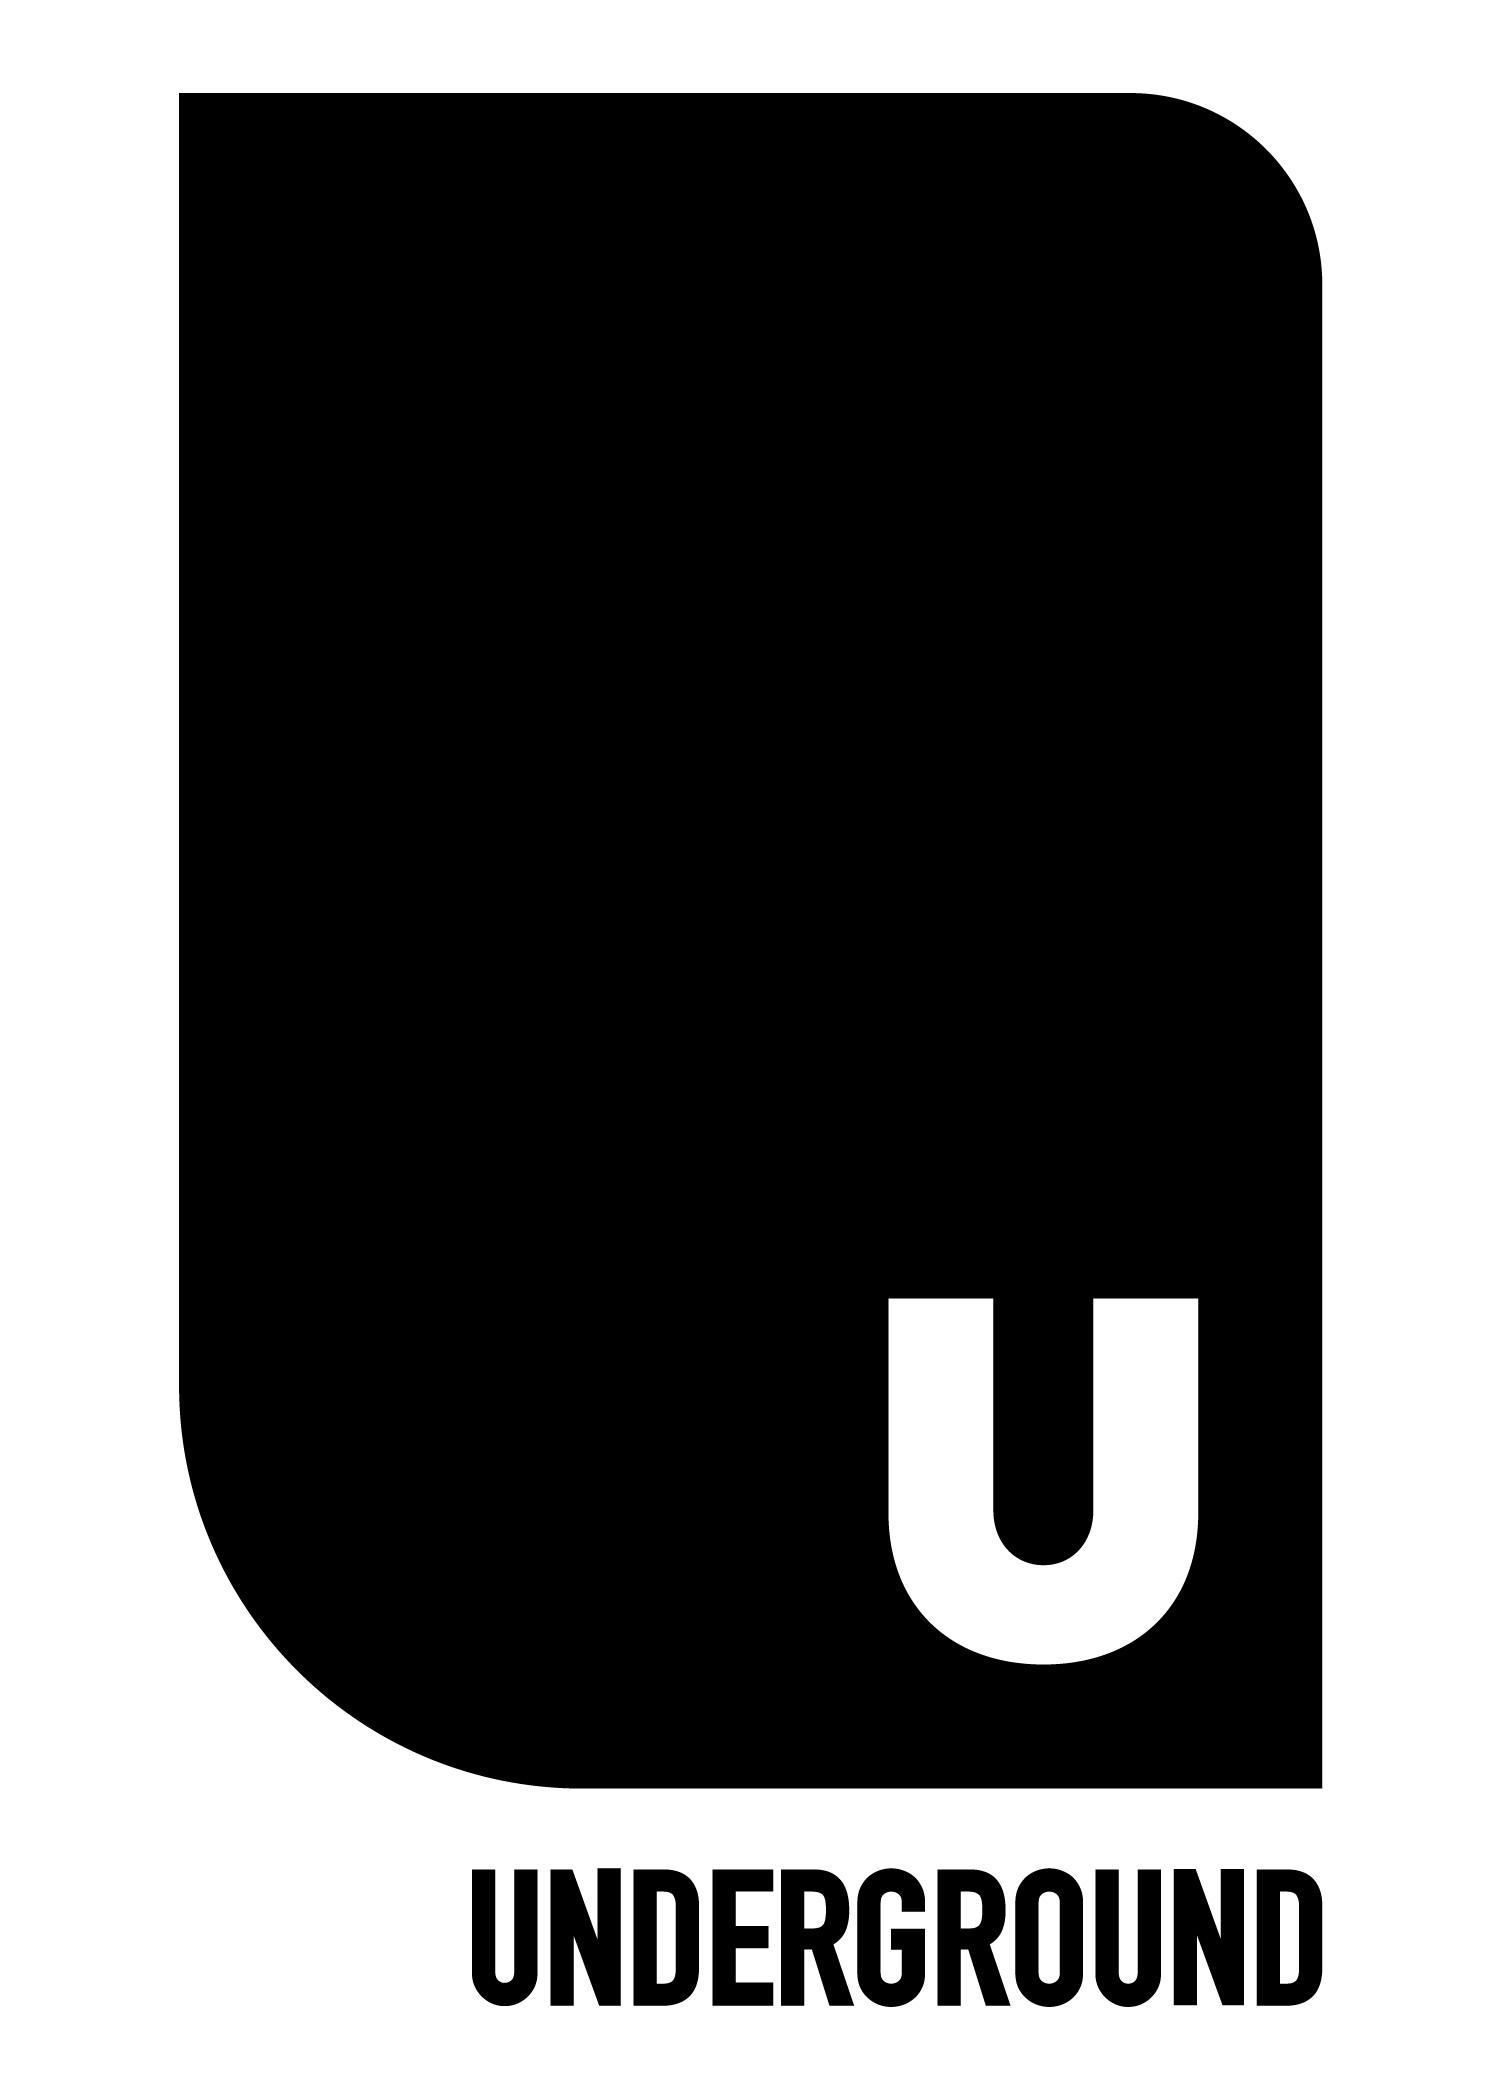 logo-vertical-black.jpg